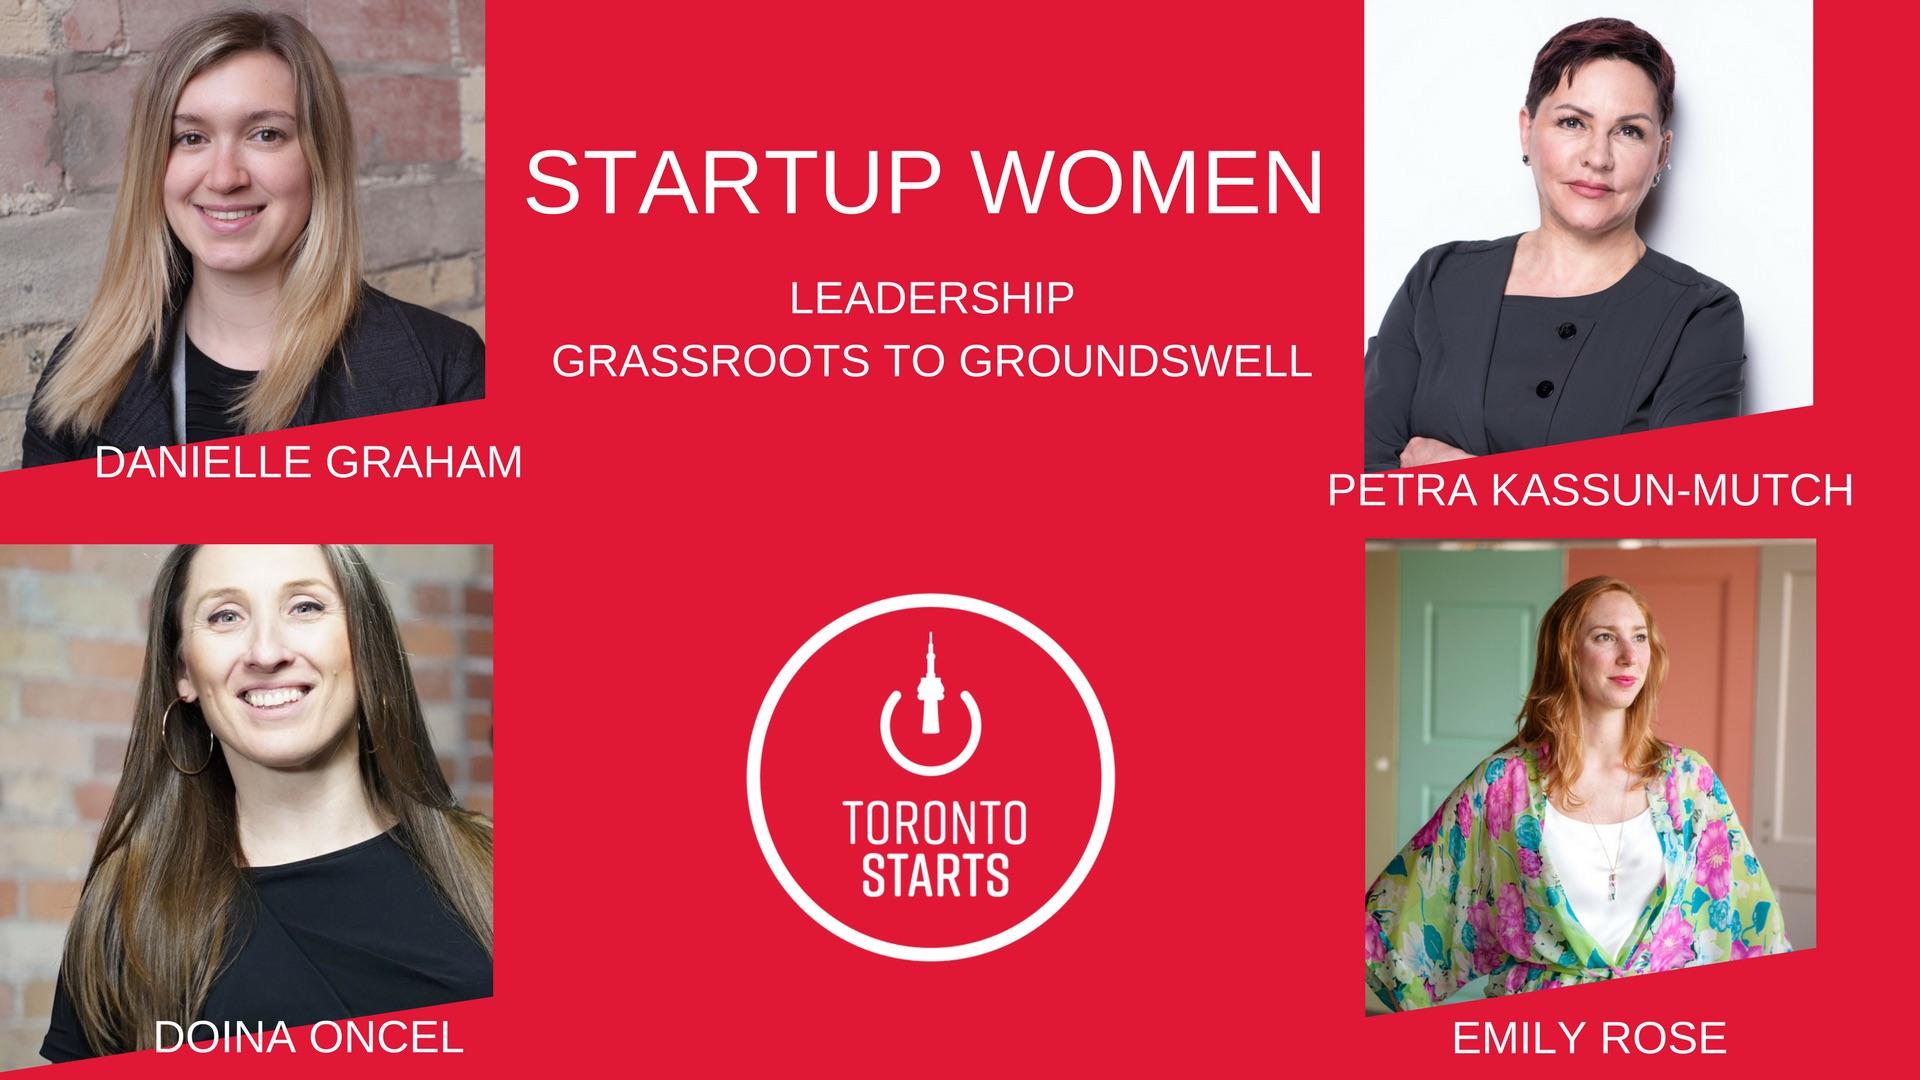 Startup Women Leadership